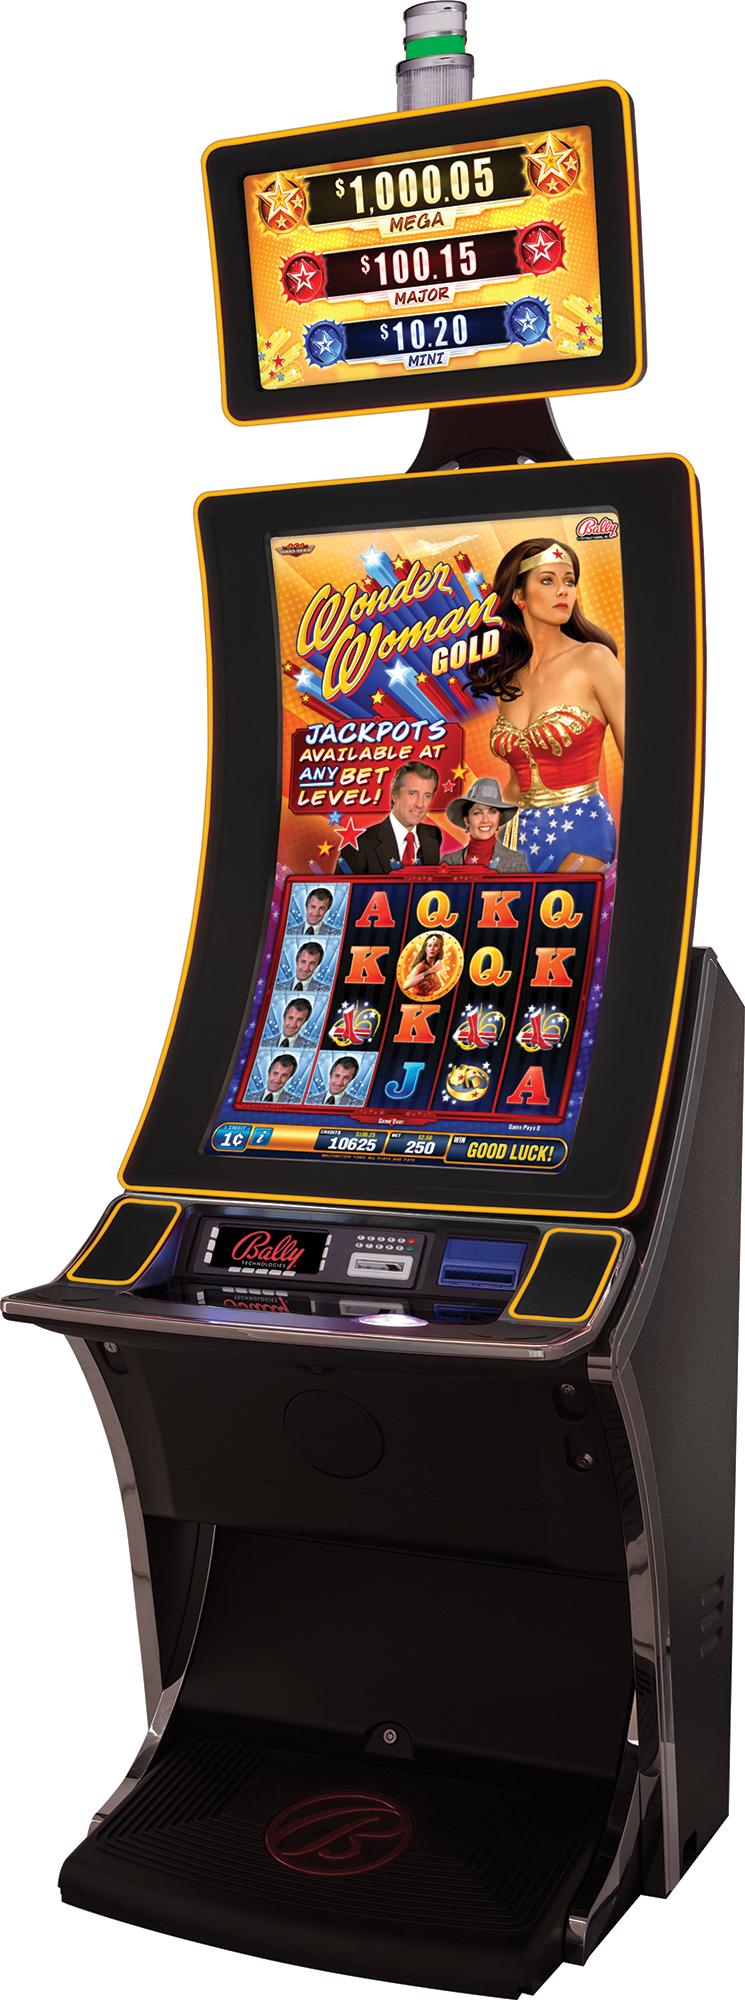 Star Jackpots Slot Machine